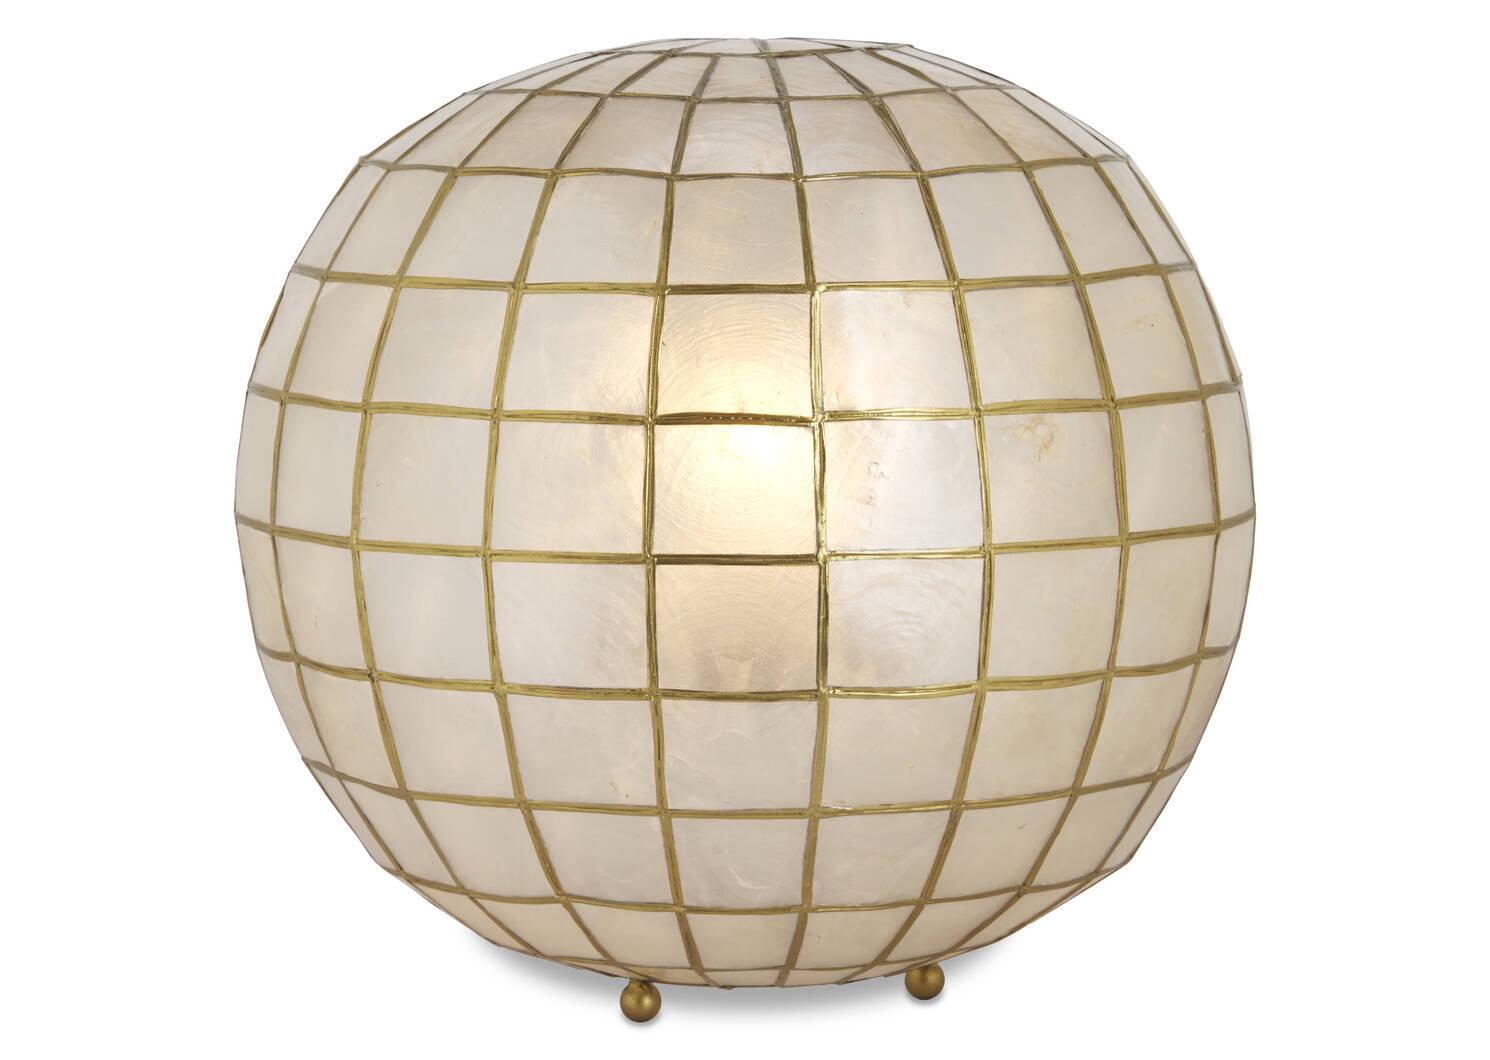 Lampe boule en nacre Capiz Ensley